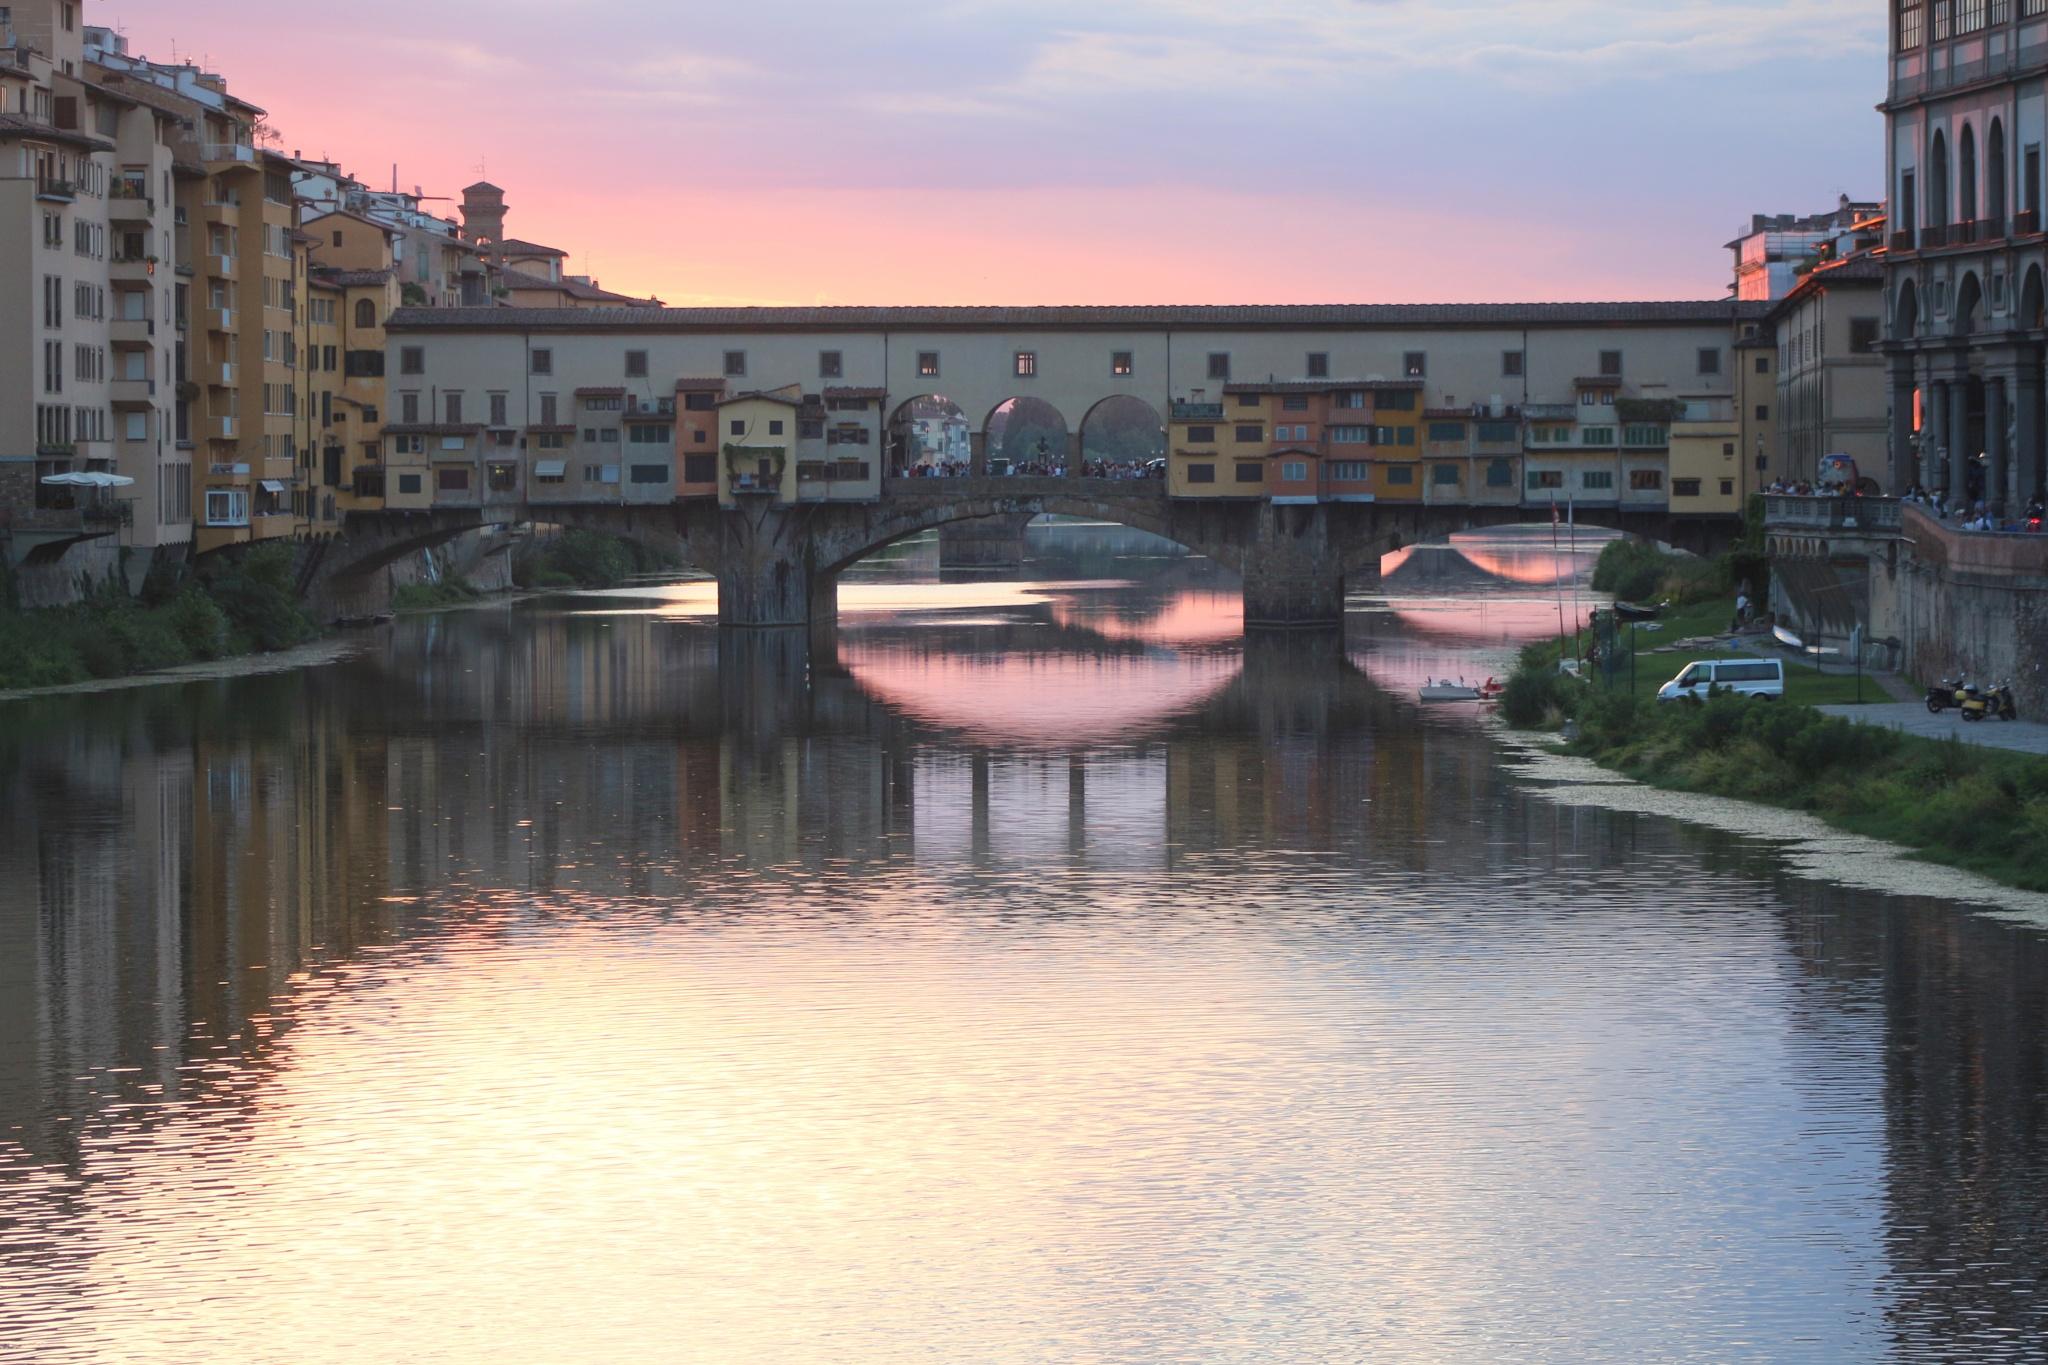 Ponte Vecchio, Firenze by katze